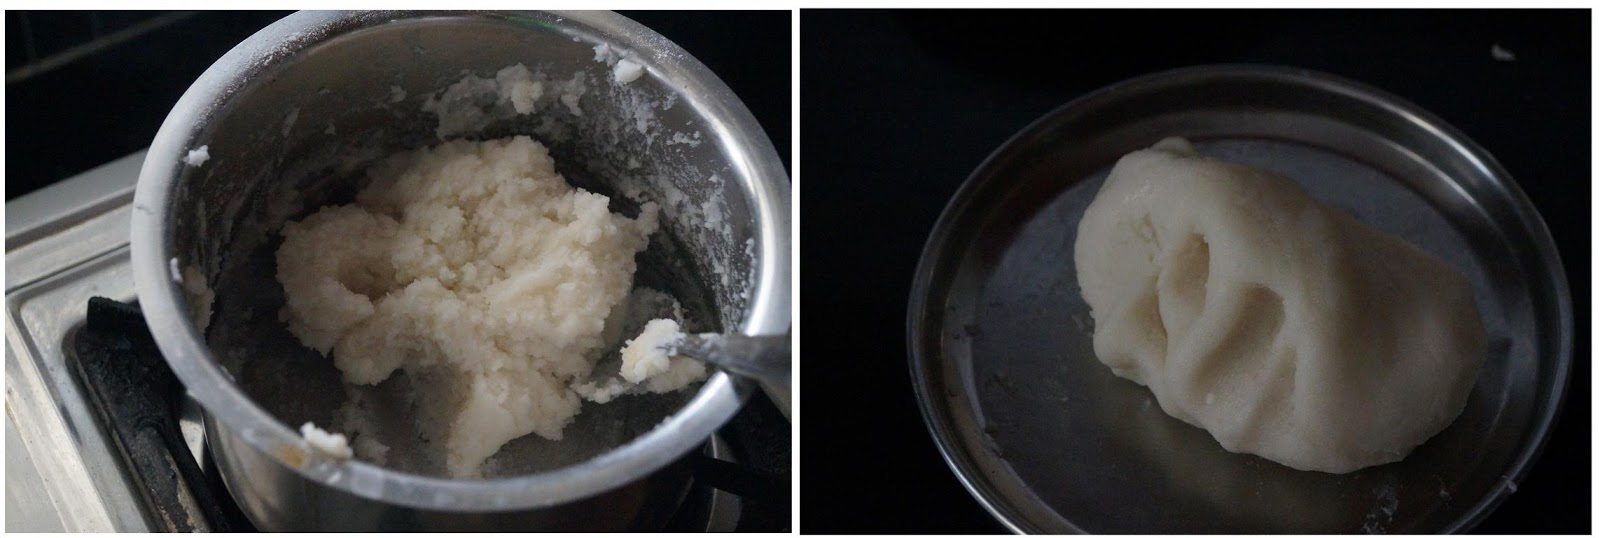 how to prepare pala undrallu dough, vinayaka chavithi recipes